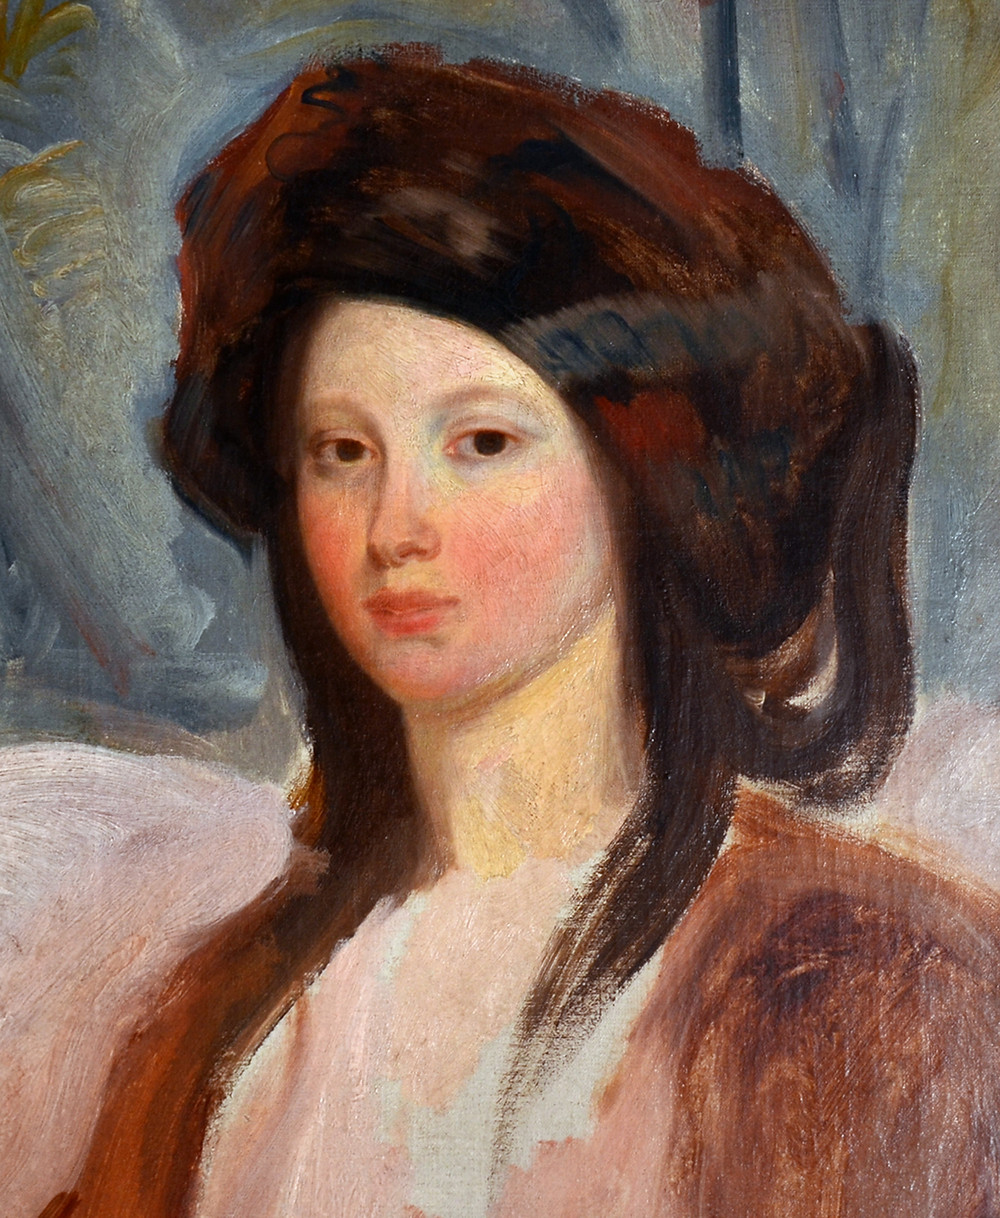 Champmartin, Portrait of Juliette Drouet, 1827 -- in the Victor Hugo Museum